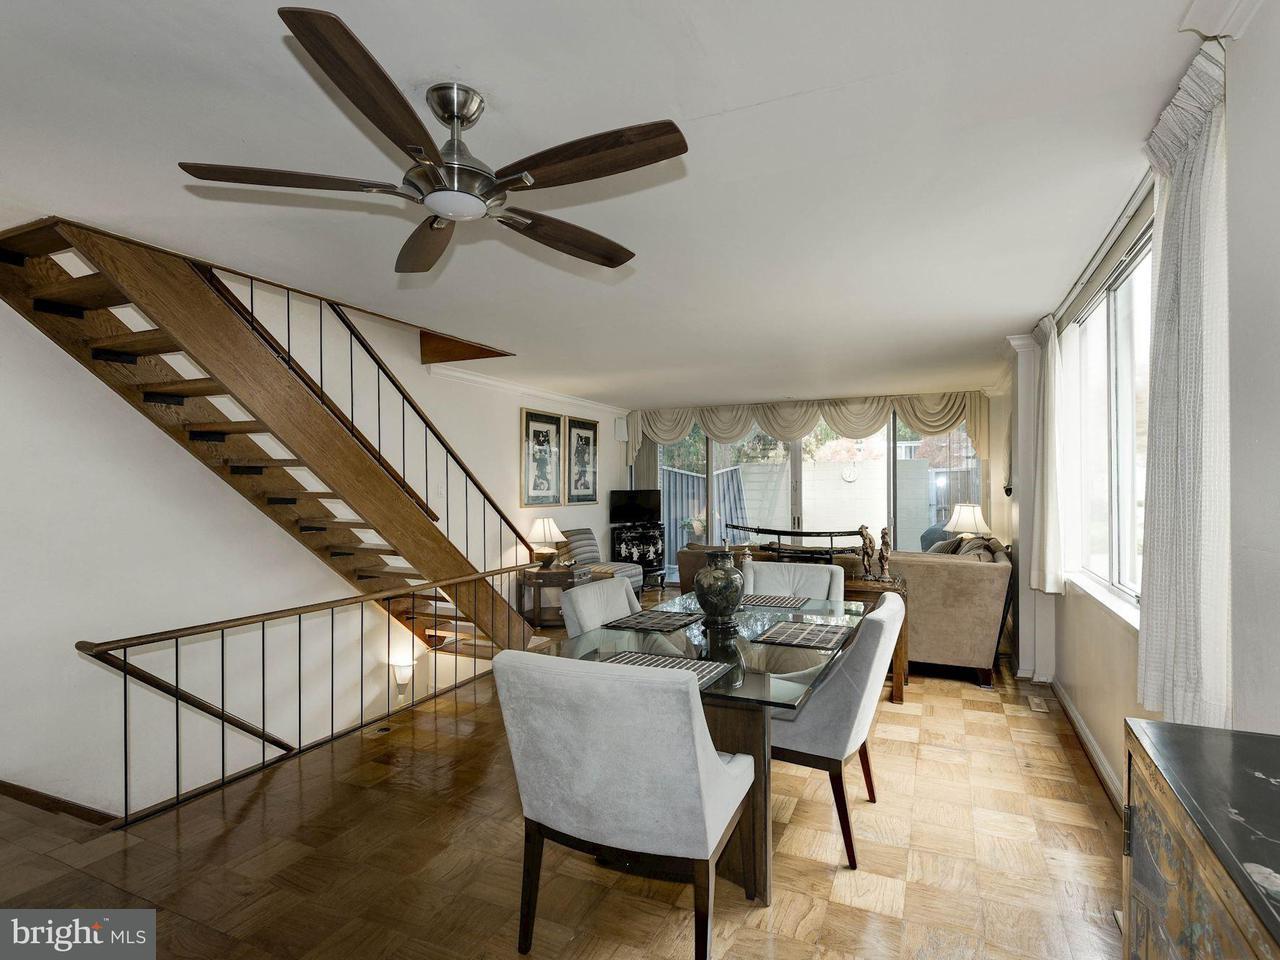 Additional photo for property listing at 343 O Street Sw Sw 343 O Street Sw Sw Washington, Περιφερεια Τησ Κολουμπια 20024 Ηνωμενεσ Πολιτειεσ